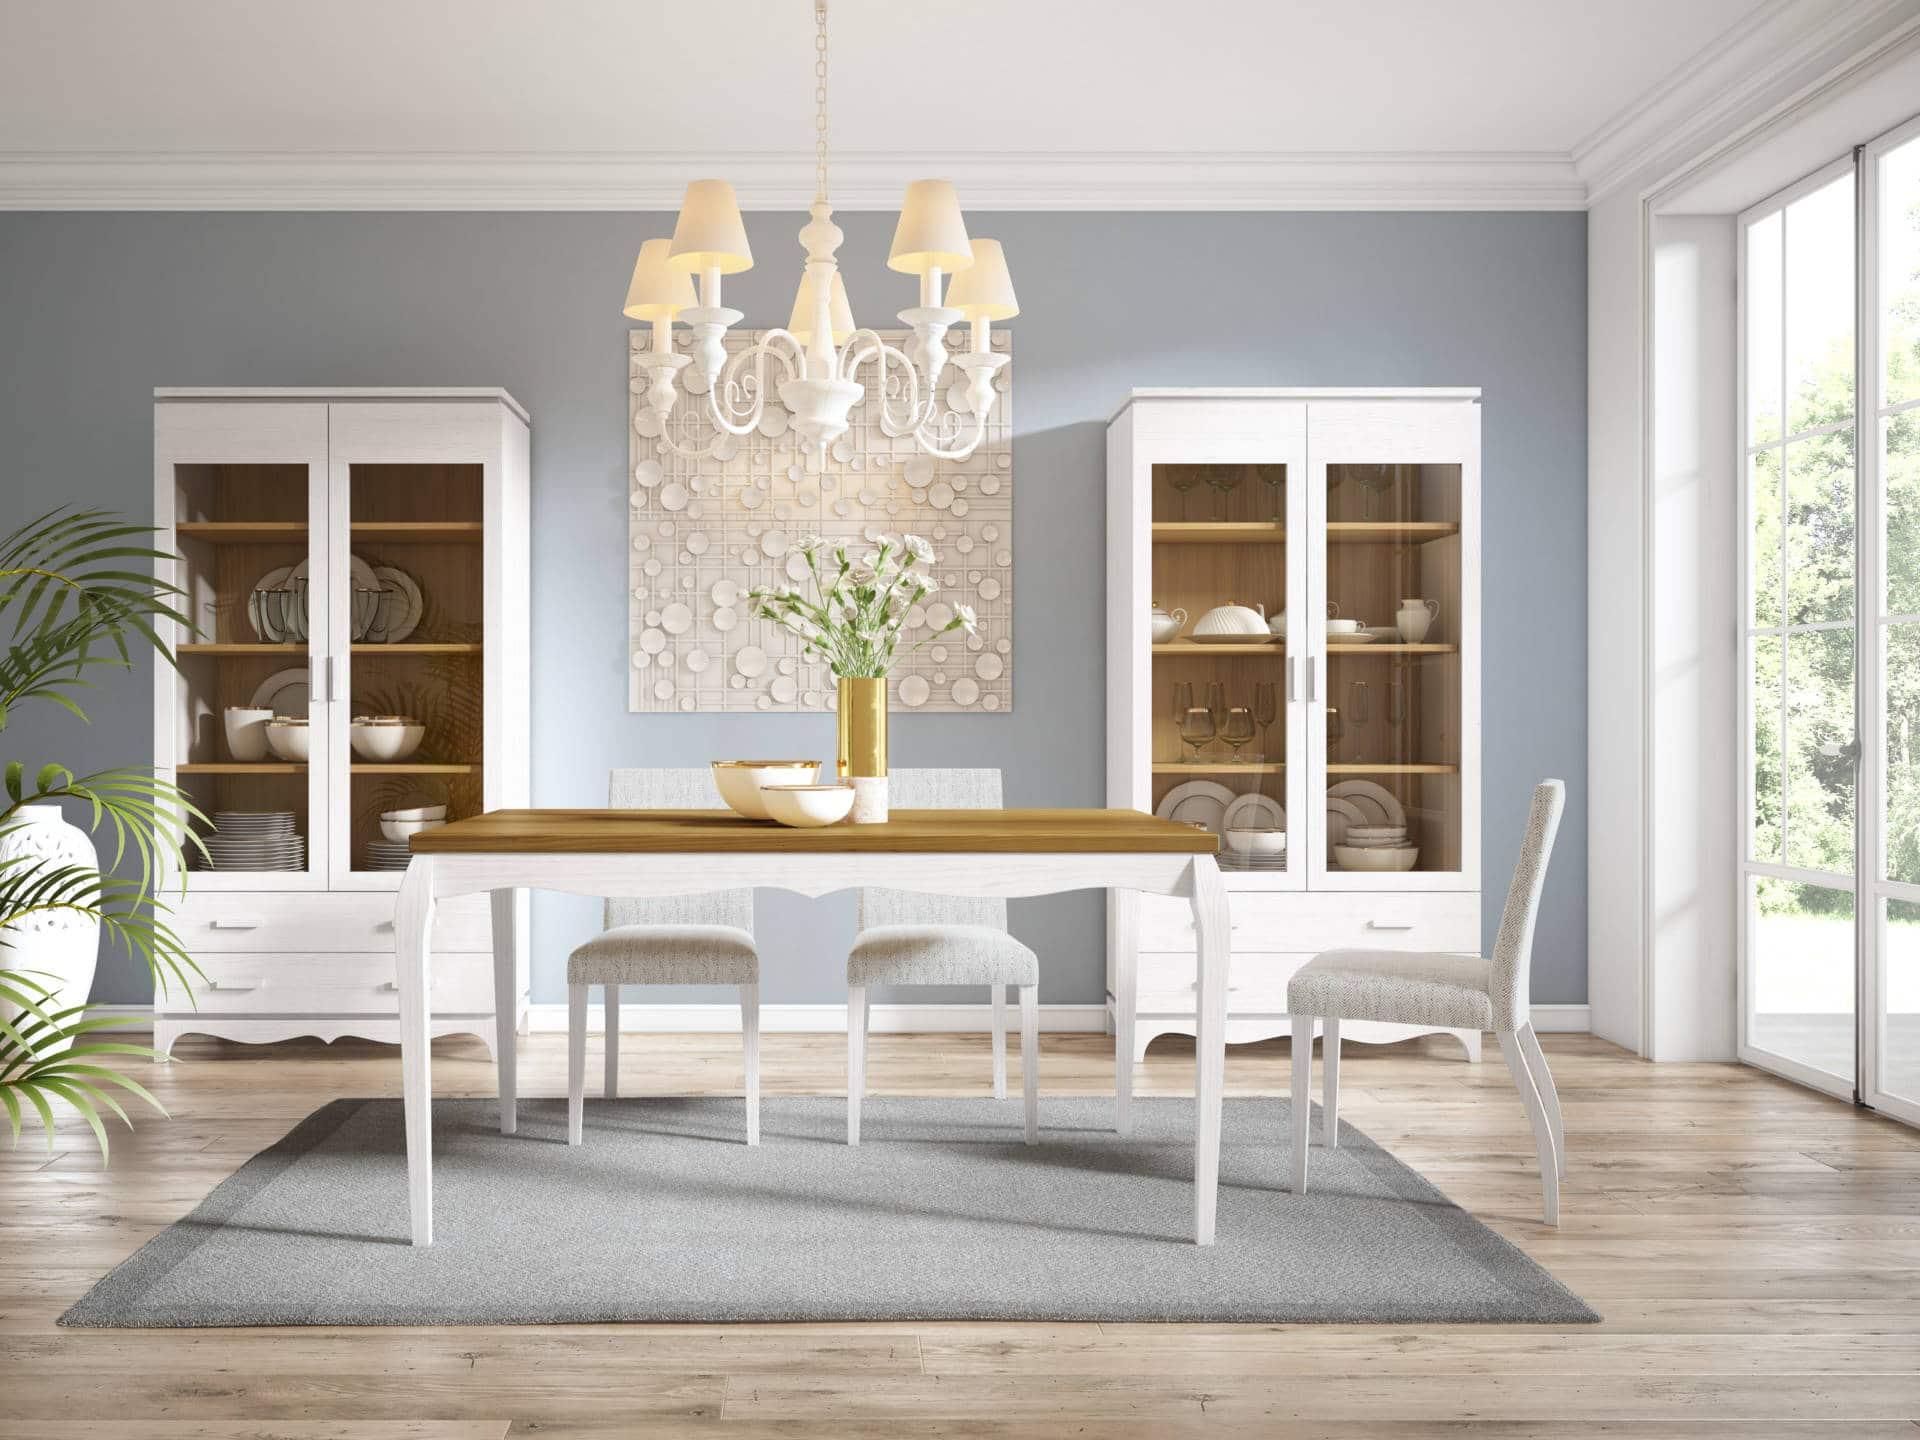 Muebles Salon Rusticos Interesting Muebles Salon Rusticos With  # Muebles Merkamueble Dodro